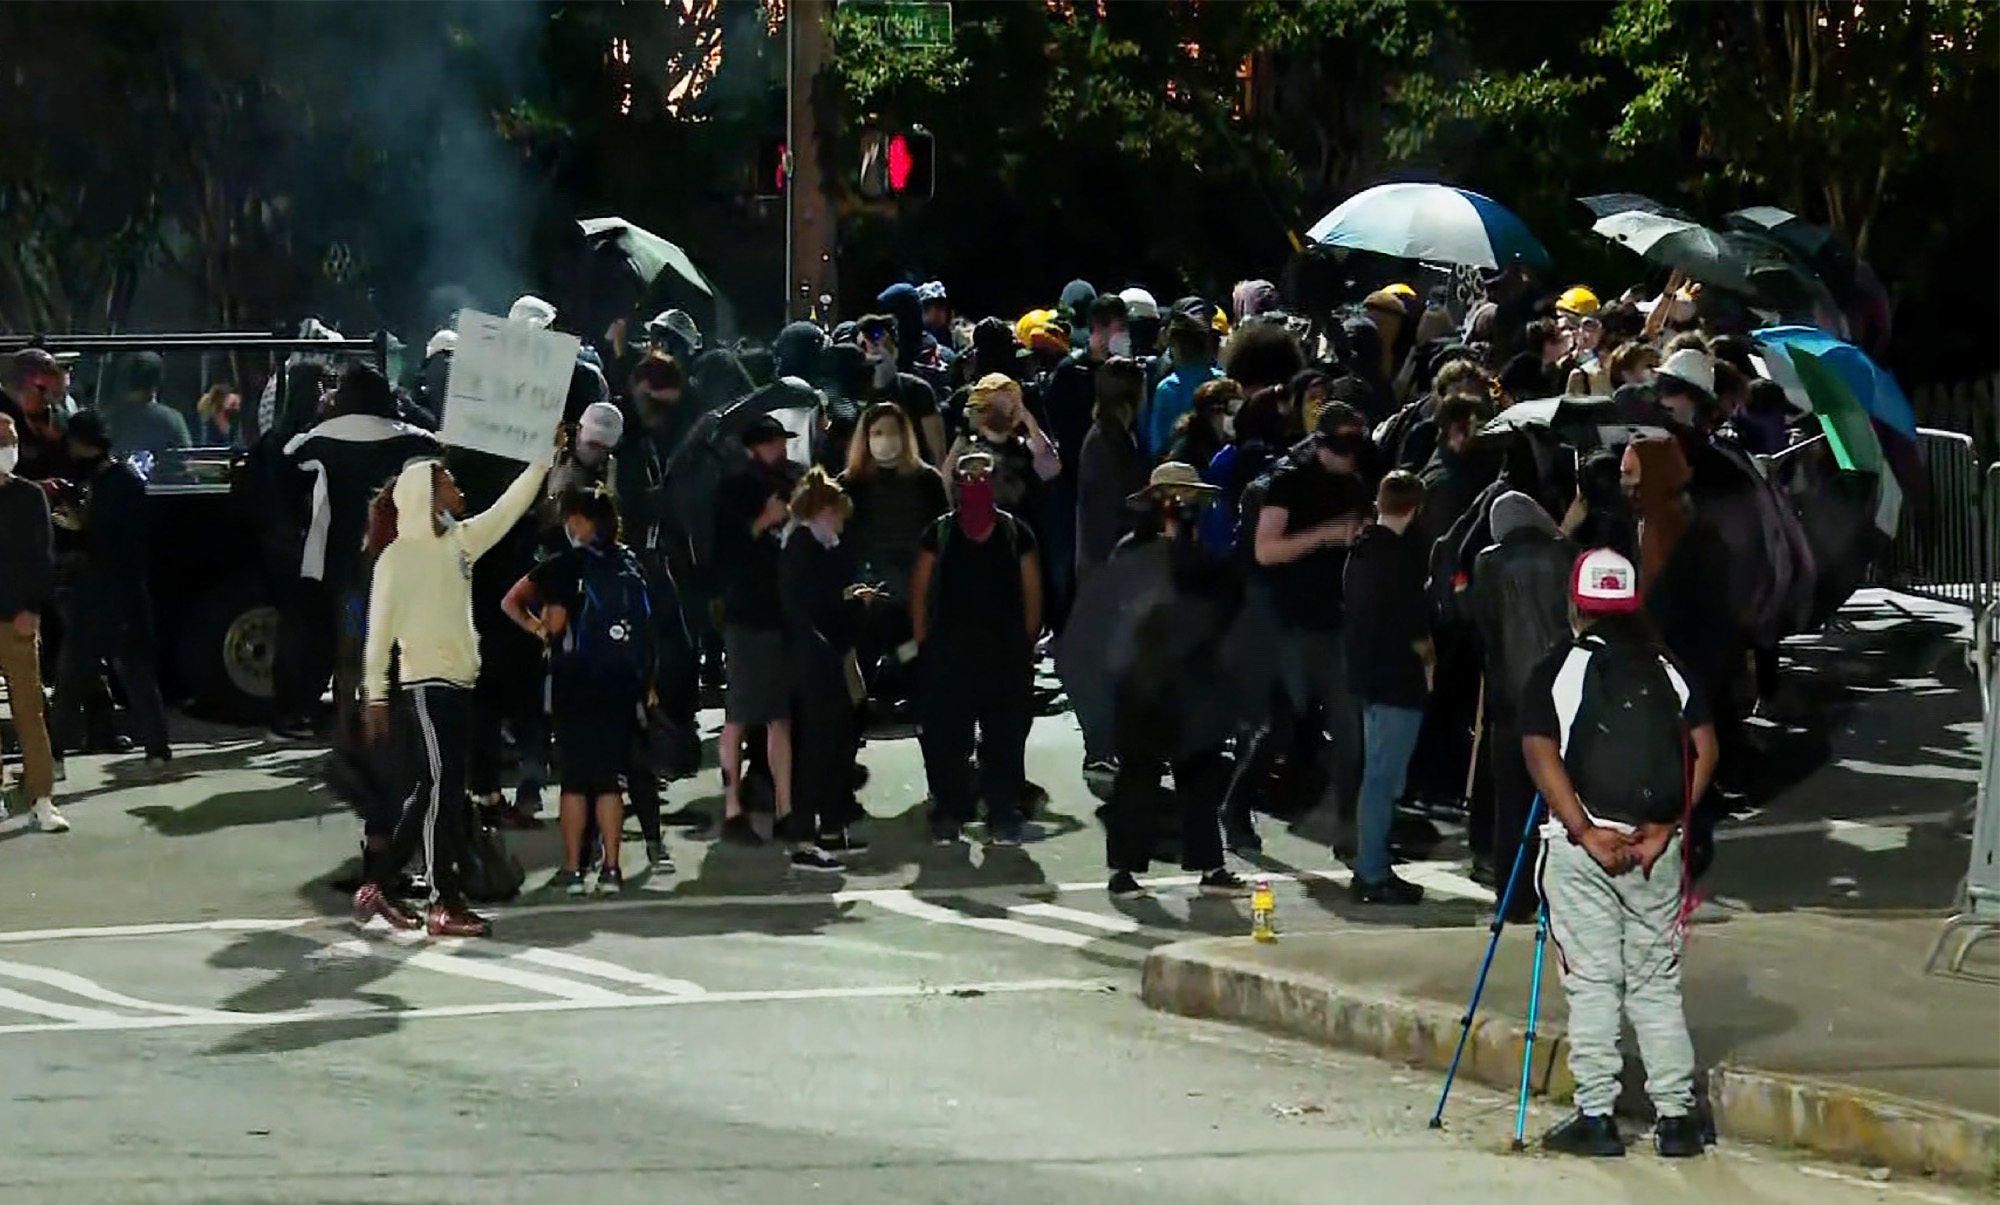 Protesters standing outside of Atlanta's Zone 3 police precinct.